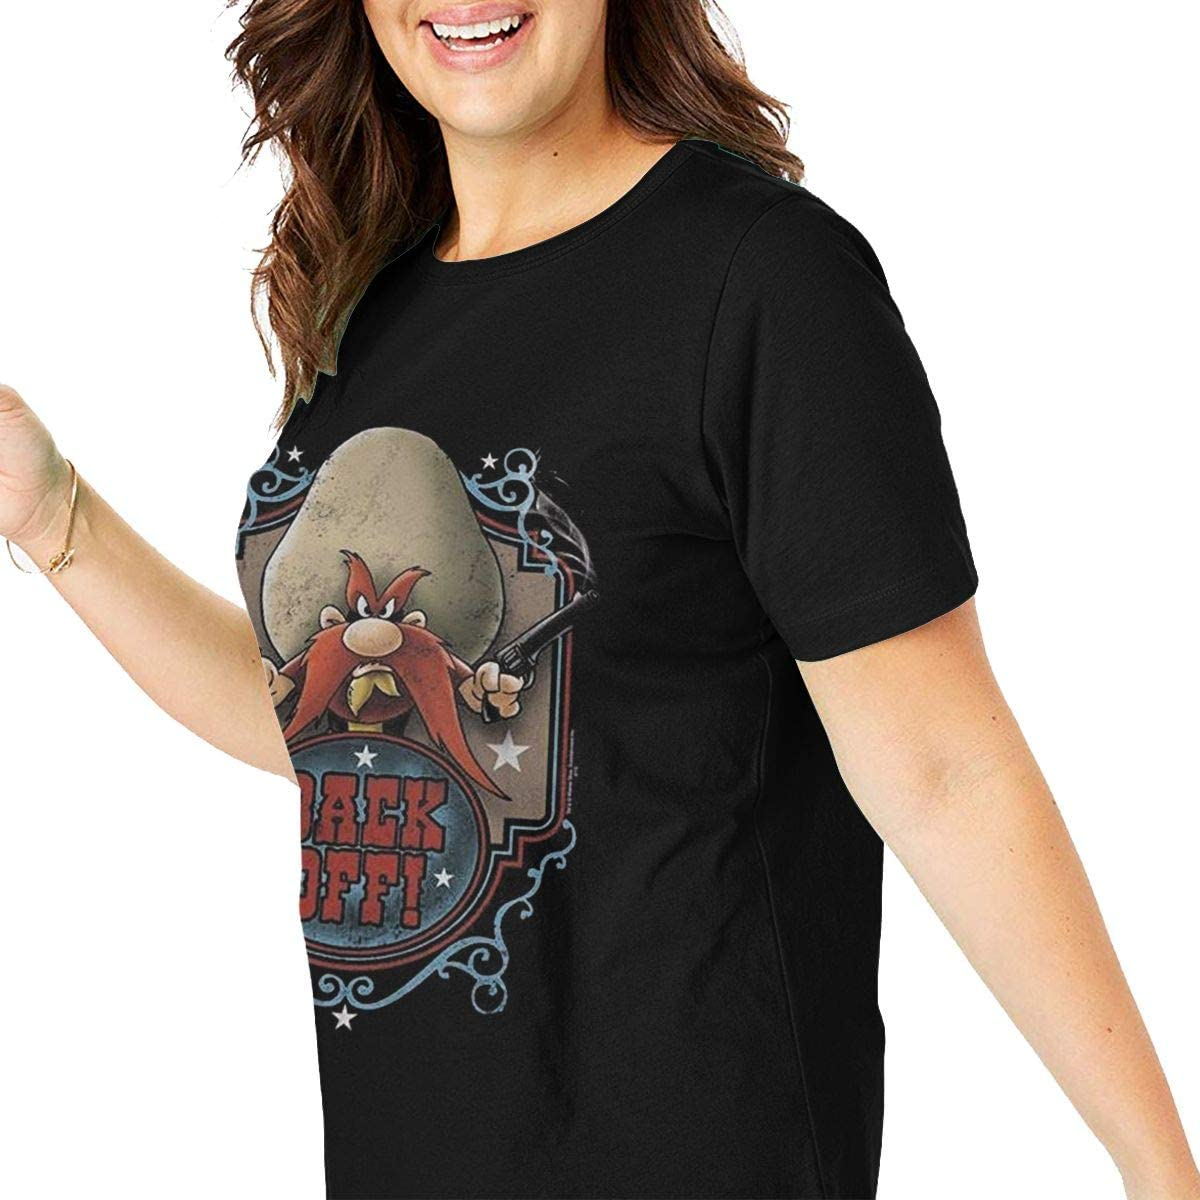 Looney-Tunes-Yosemite-Sam-Back-Off T-Shirt Womens Fashion Plus Size Fitness Athletic Yoga Tops Size XL-6XL